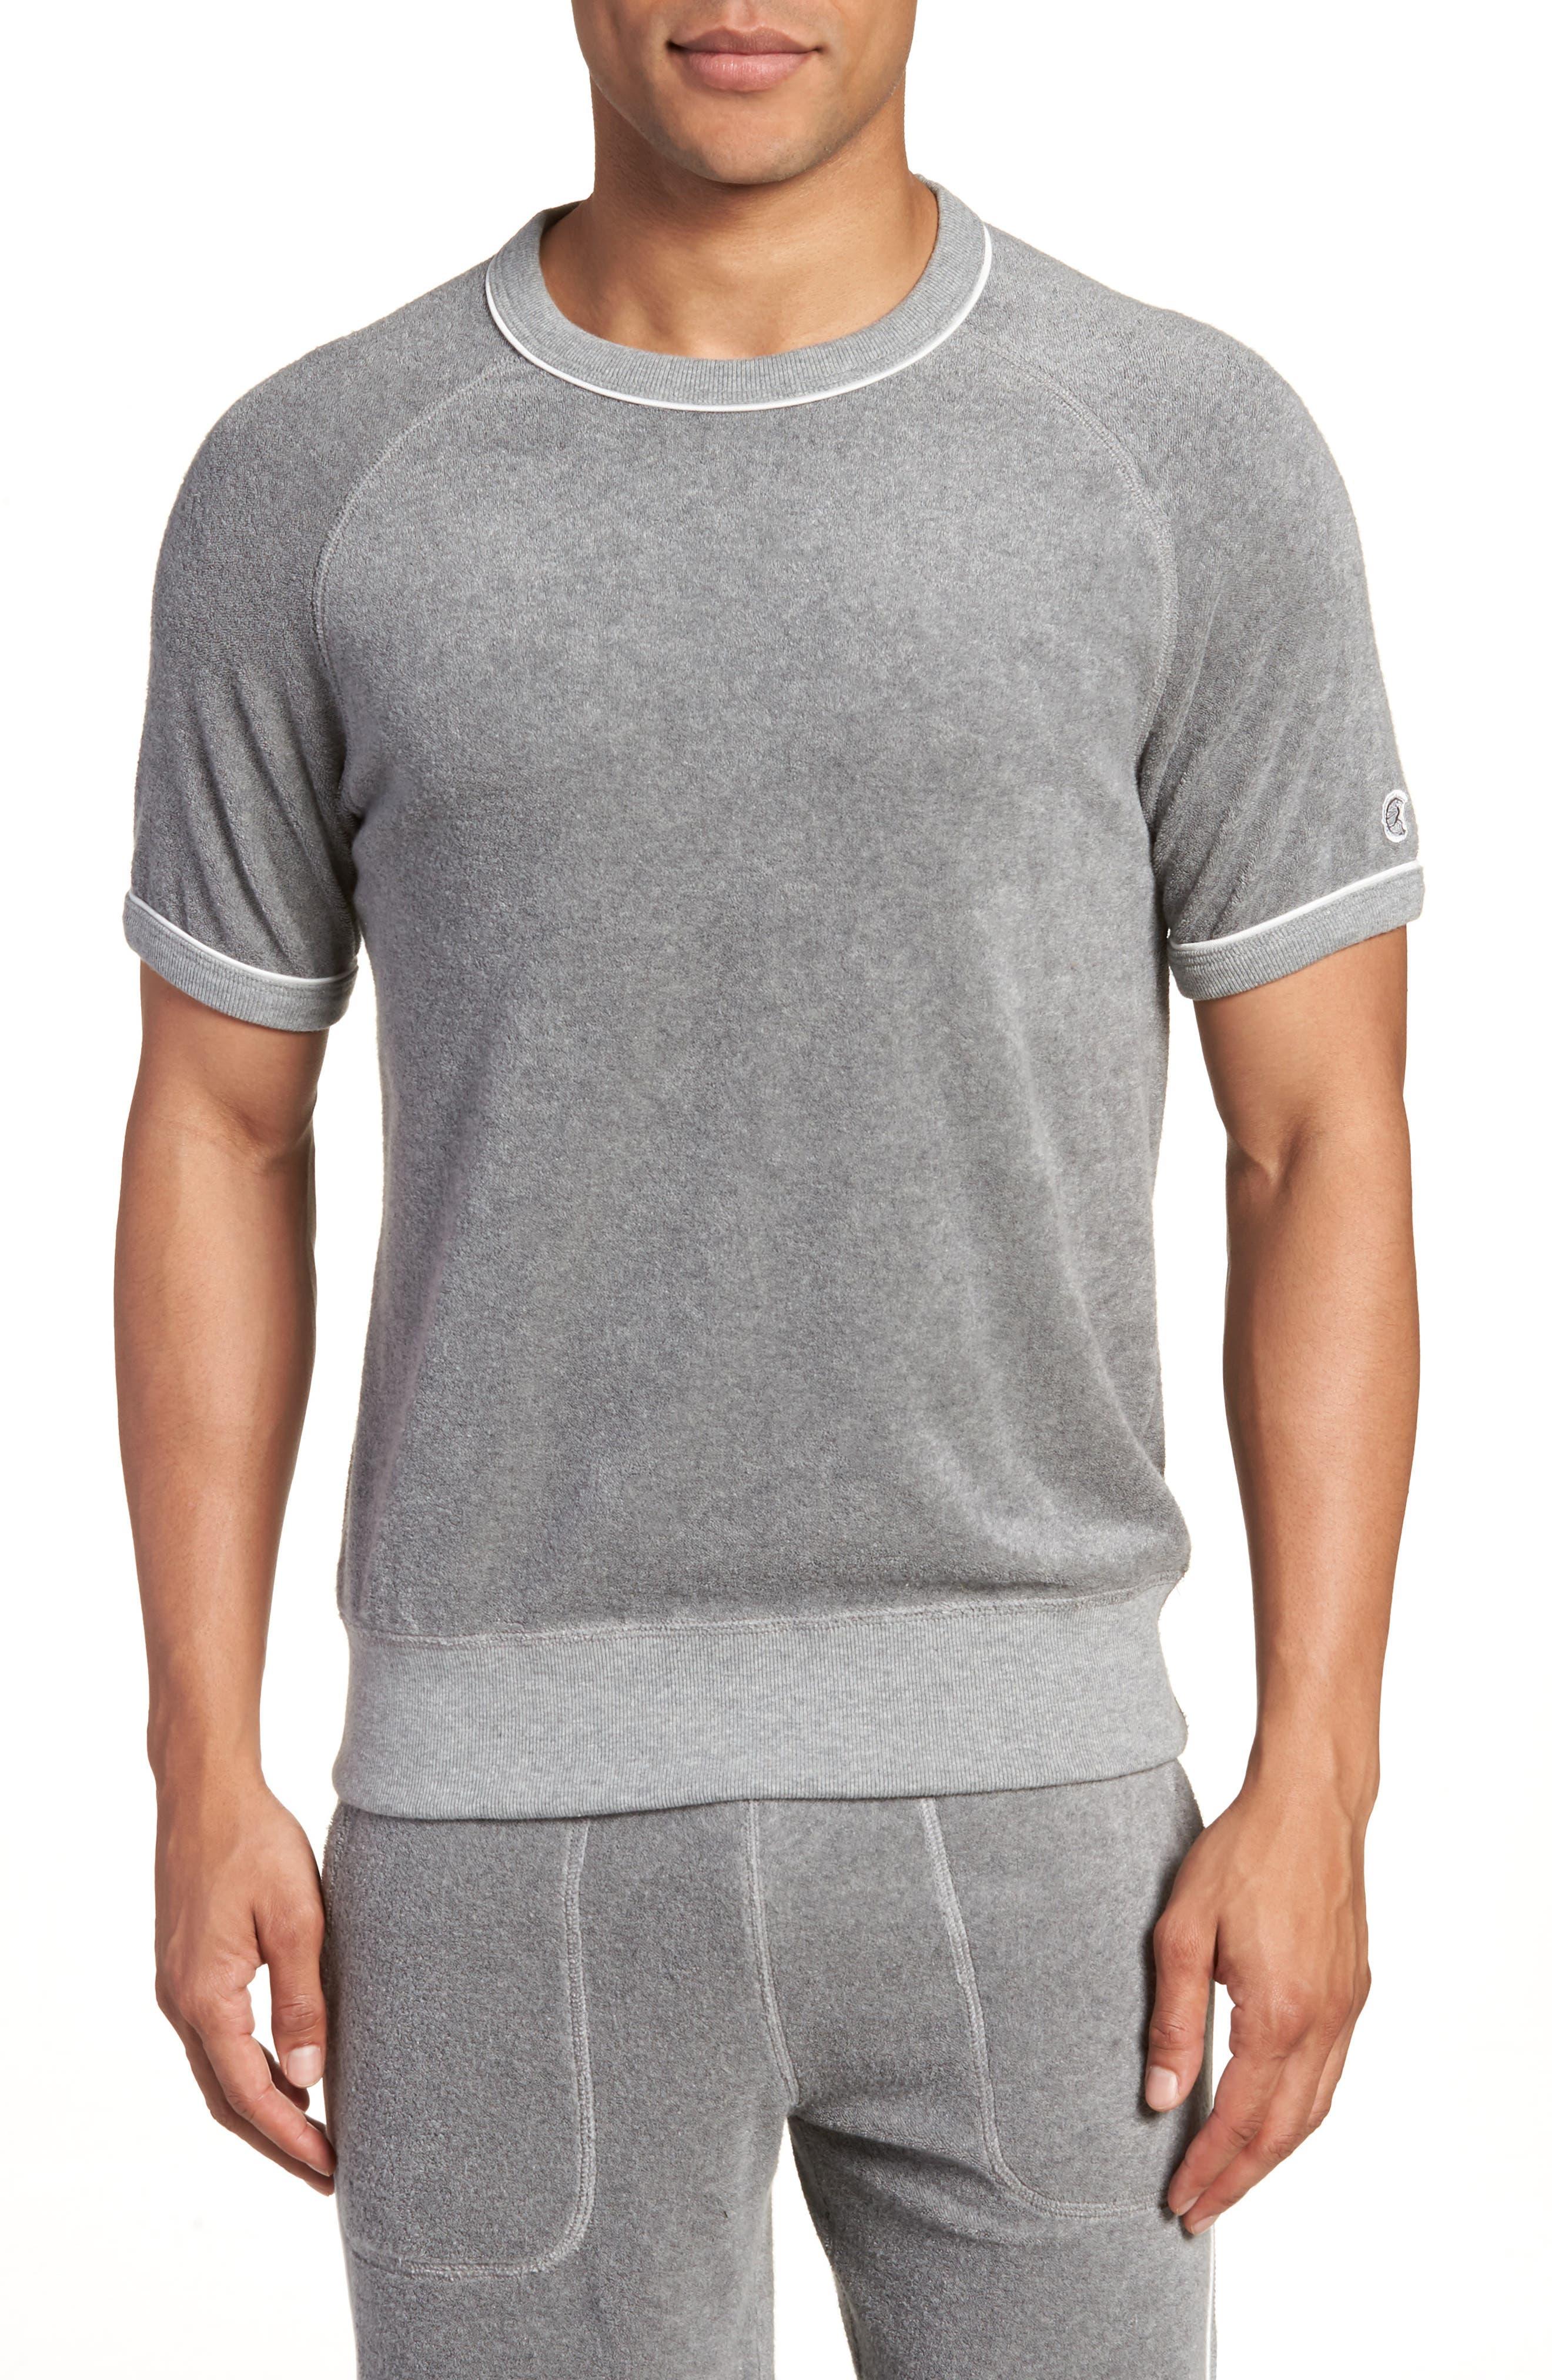 Todd Snyder + Champion Short Sleeve Terry Sweatshirt